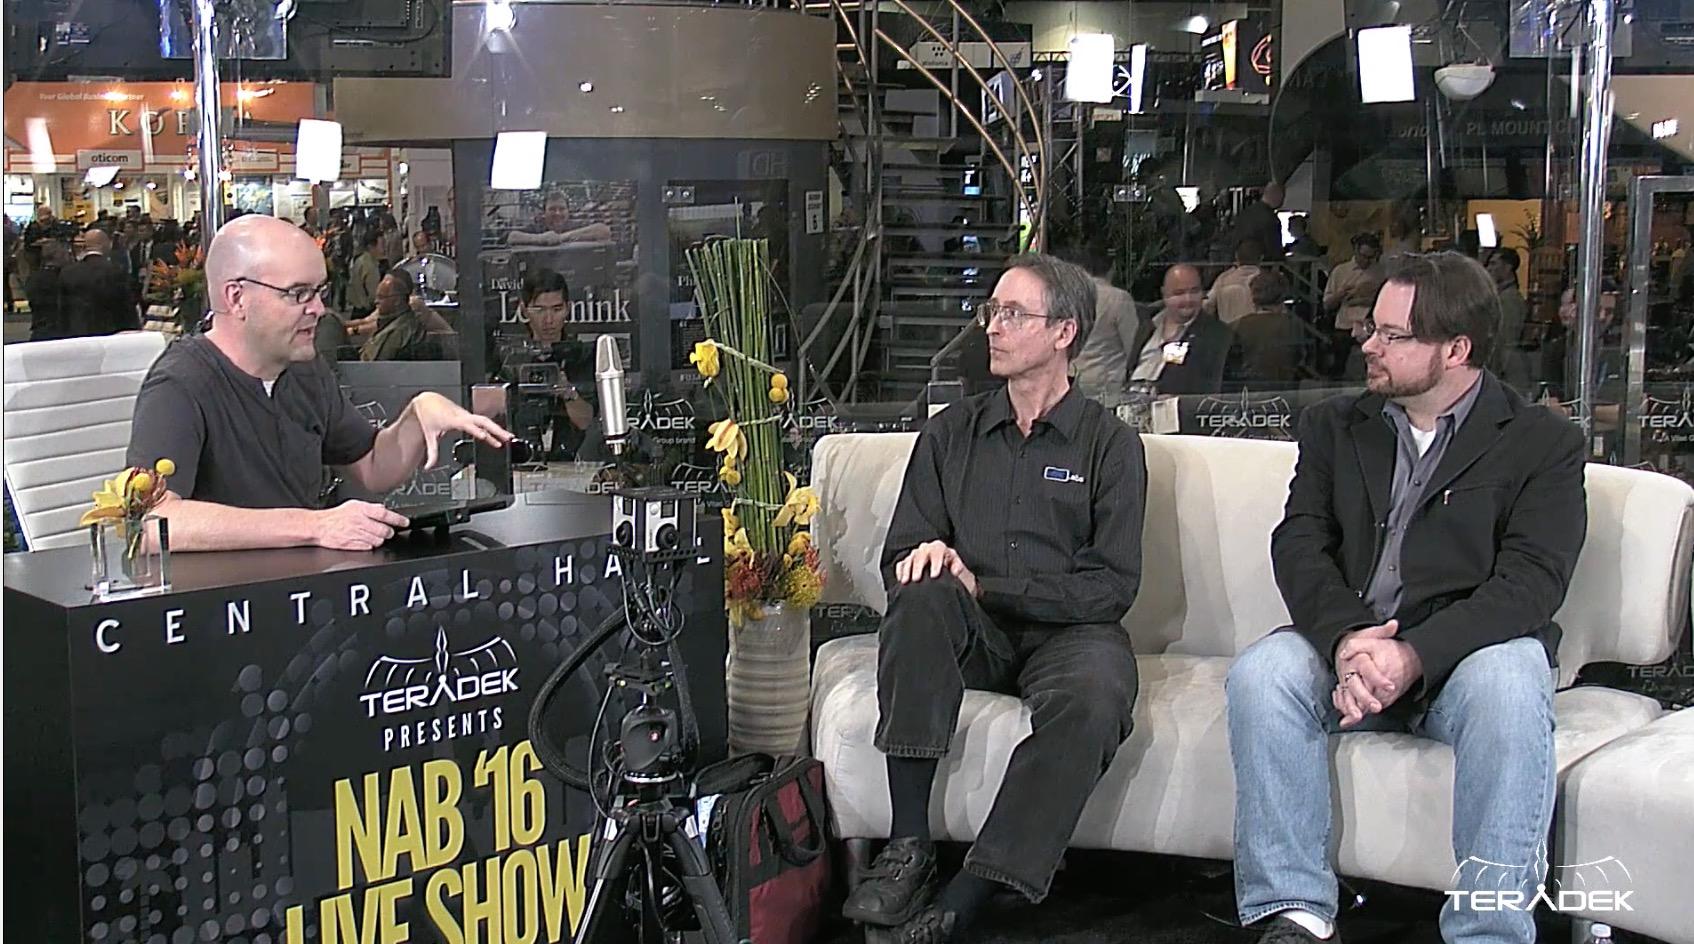 NAB 2016 Teradek Live Show PVC Panel - Where We Are Now 7